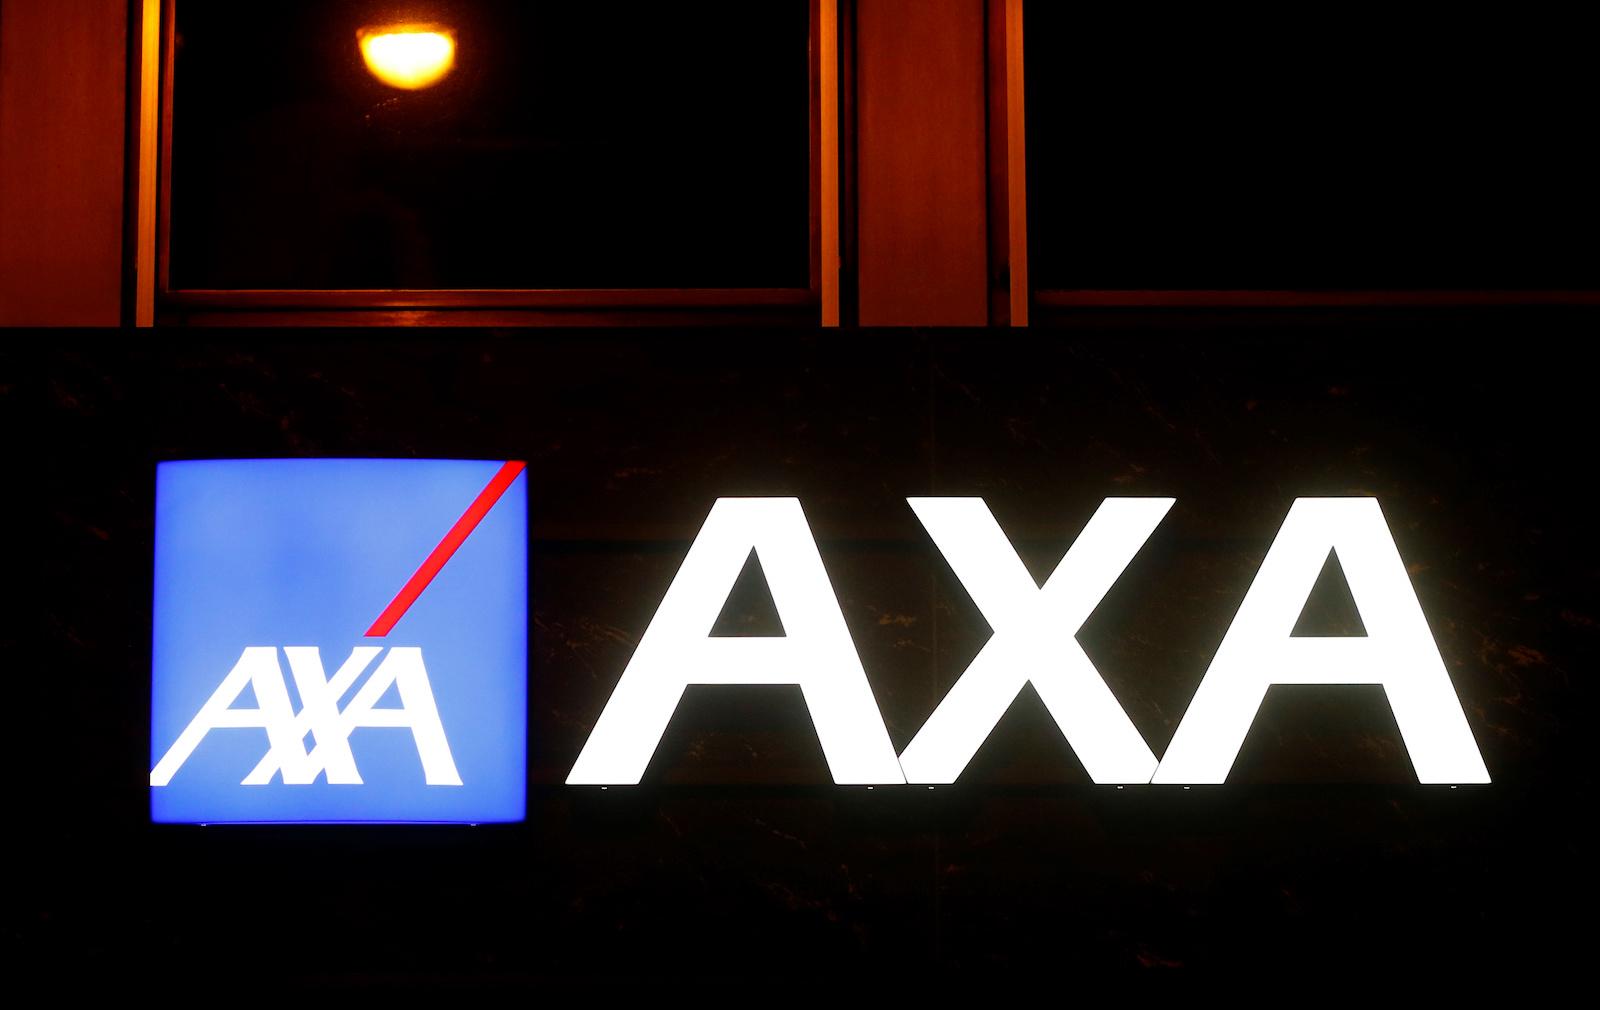 The logo of AXA insurance is seen at an office building in Basel, Switzerland March 2, 2020. REUTERS/Arnd Wiegmann - RC2PBF9JEF7Y